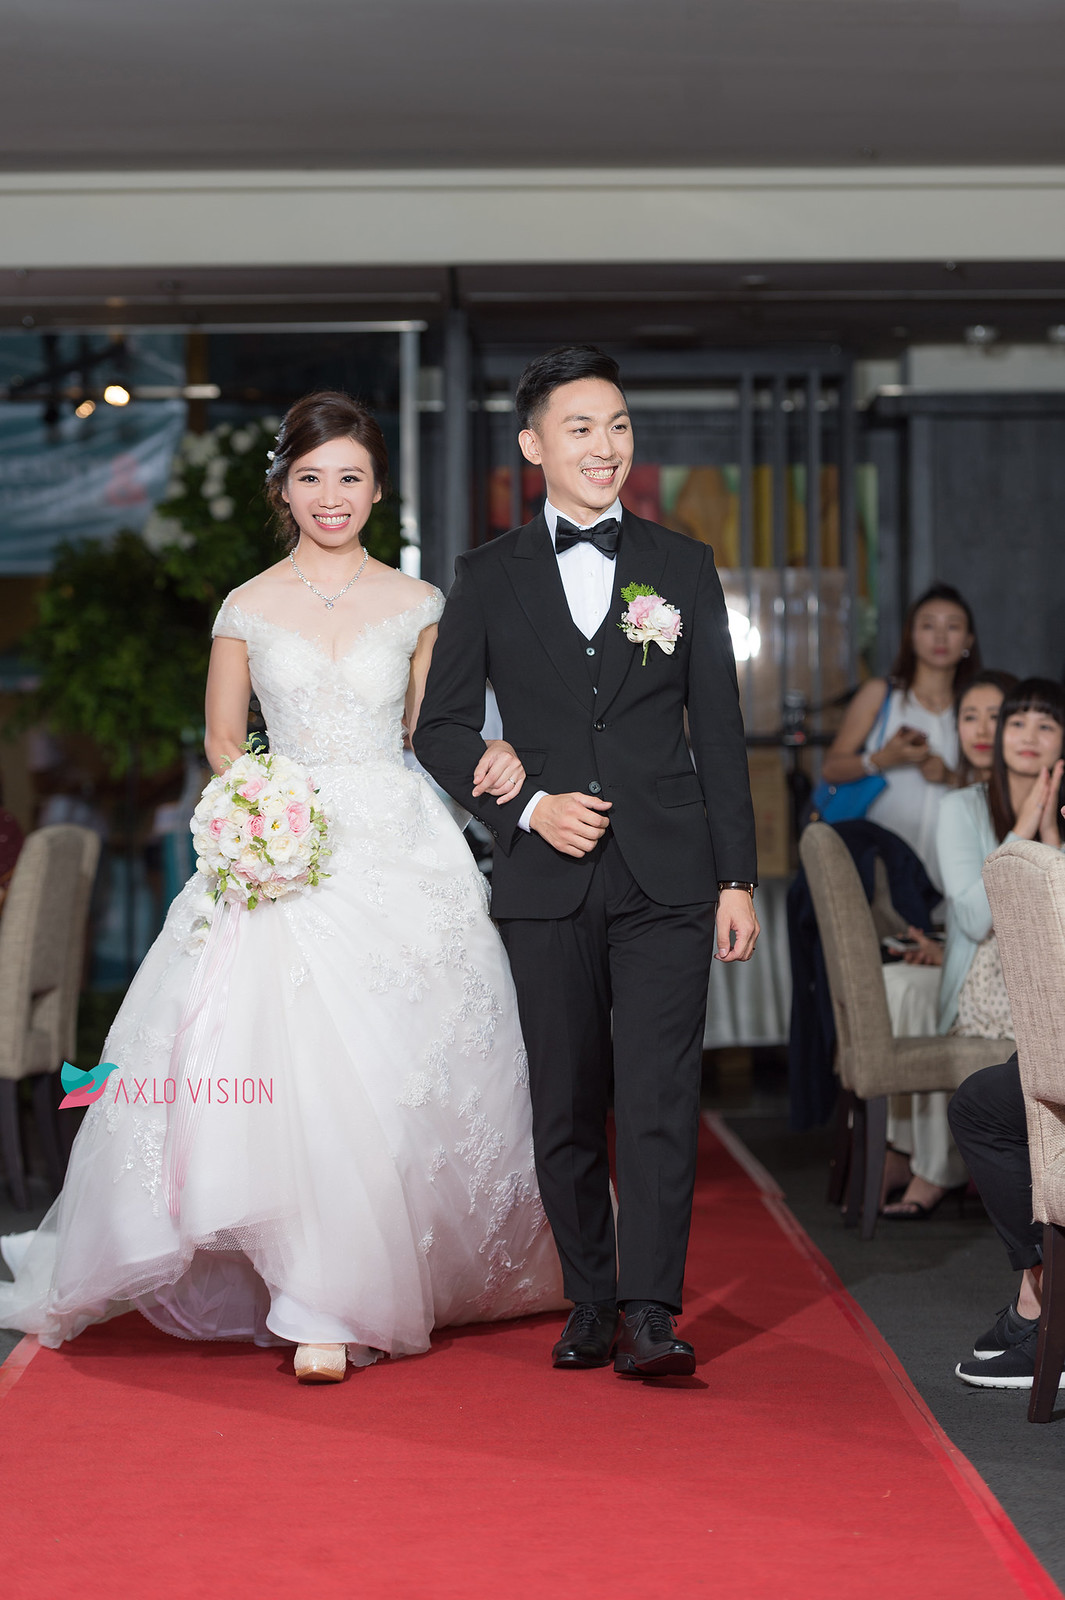 20170916 WeddingDay_148